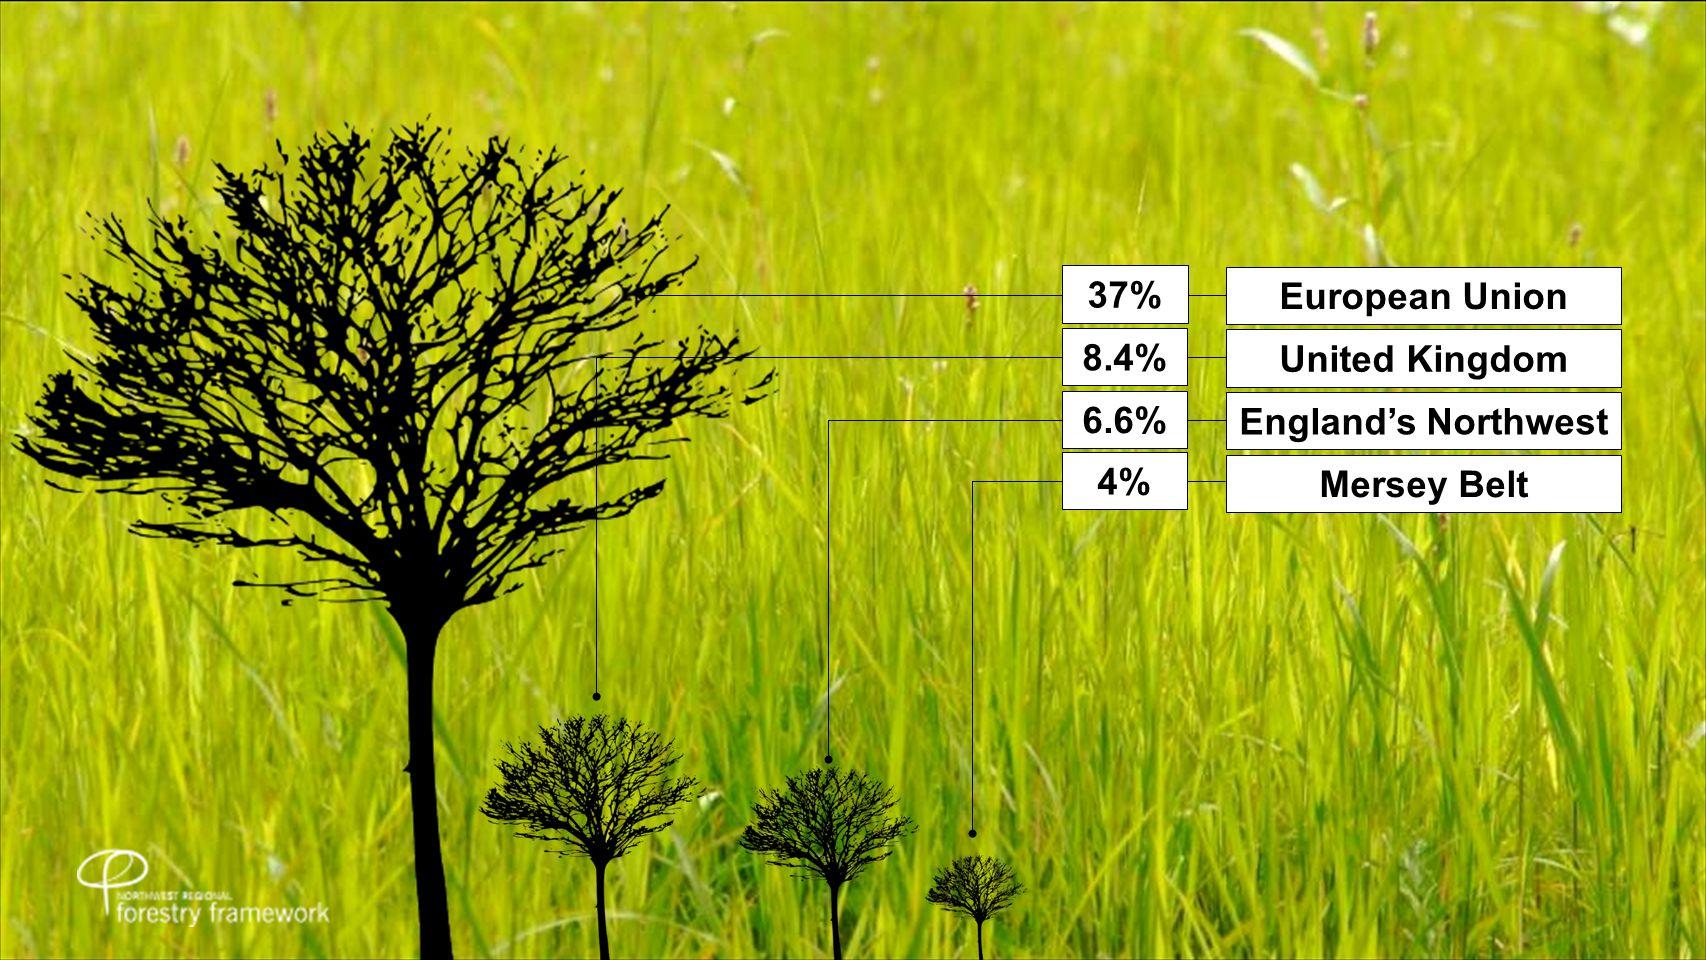 European Union 37% United Kingdom 8.4% England's Northwest 6.6% Mersey Belt 4%